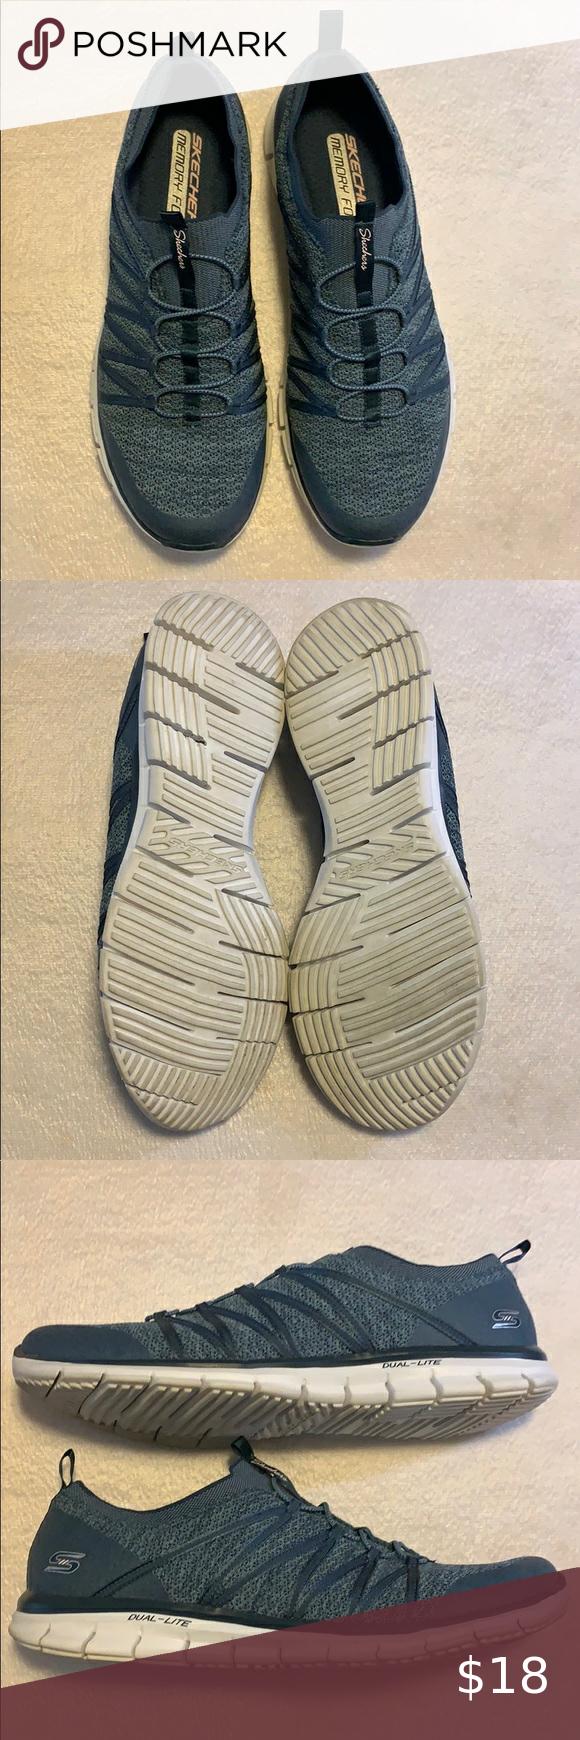 Skechers, Womens shoes sneakers